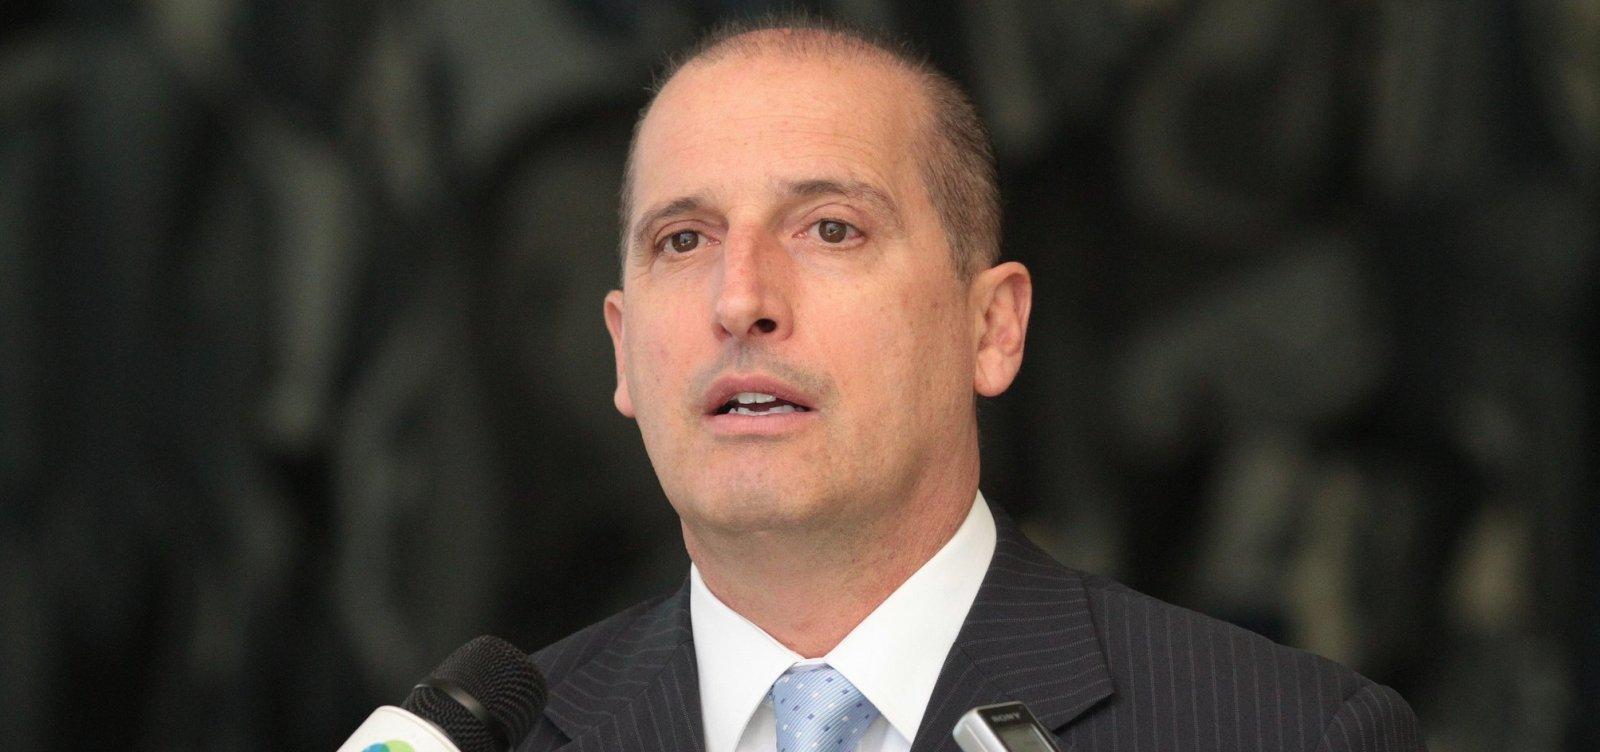 [Onyx Lorenzoni será nomeado ministro extraordinário, diz jornal]